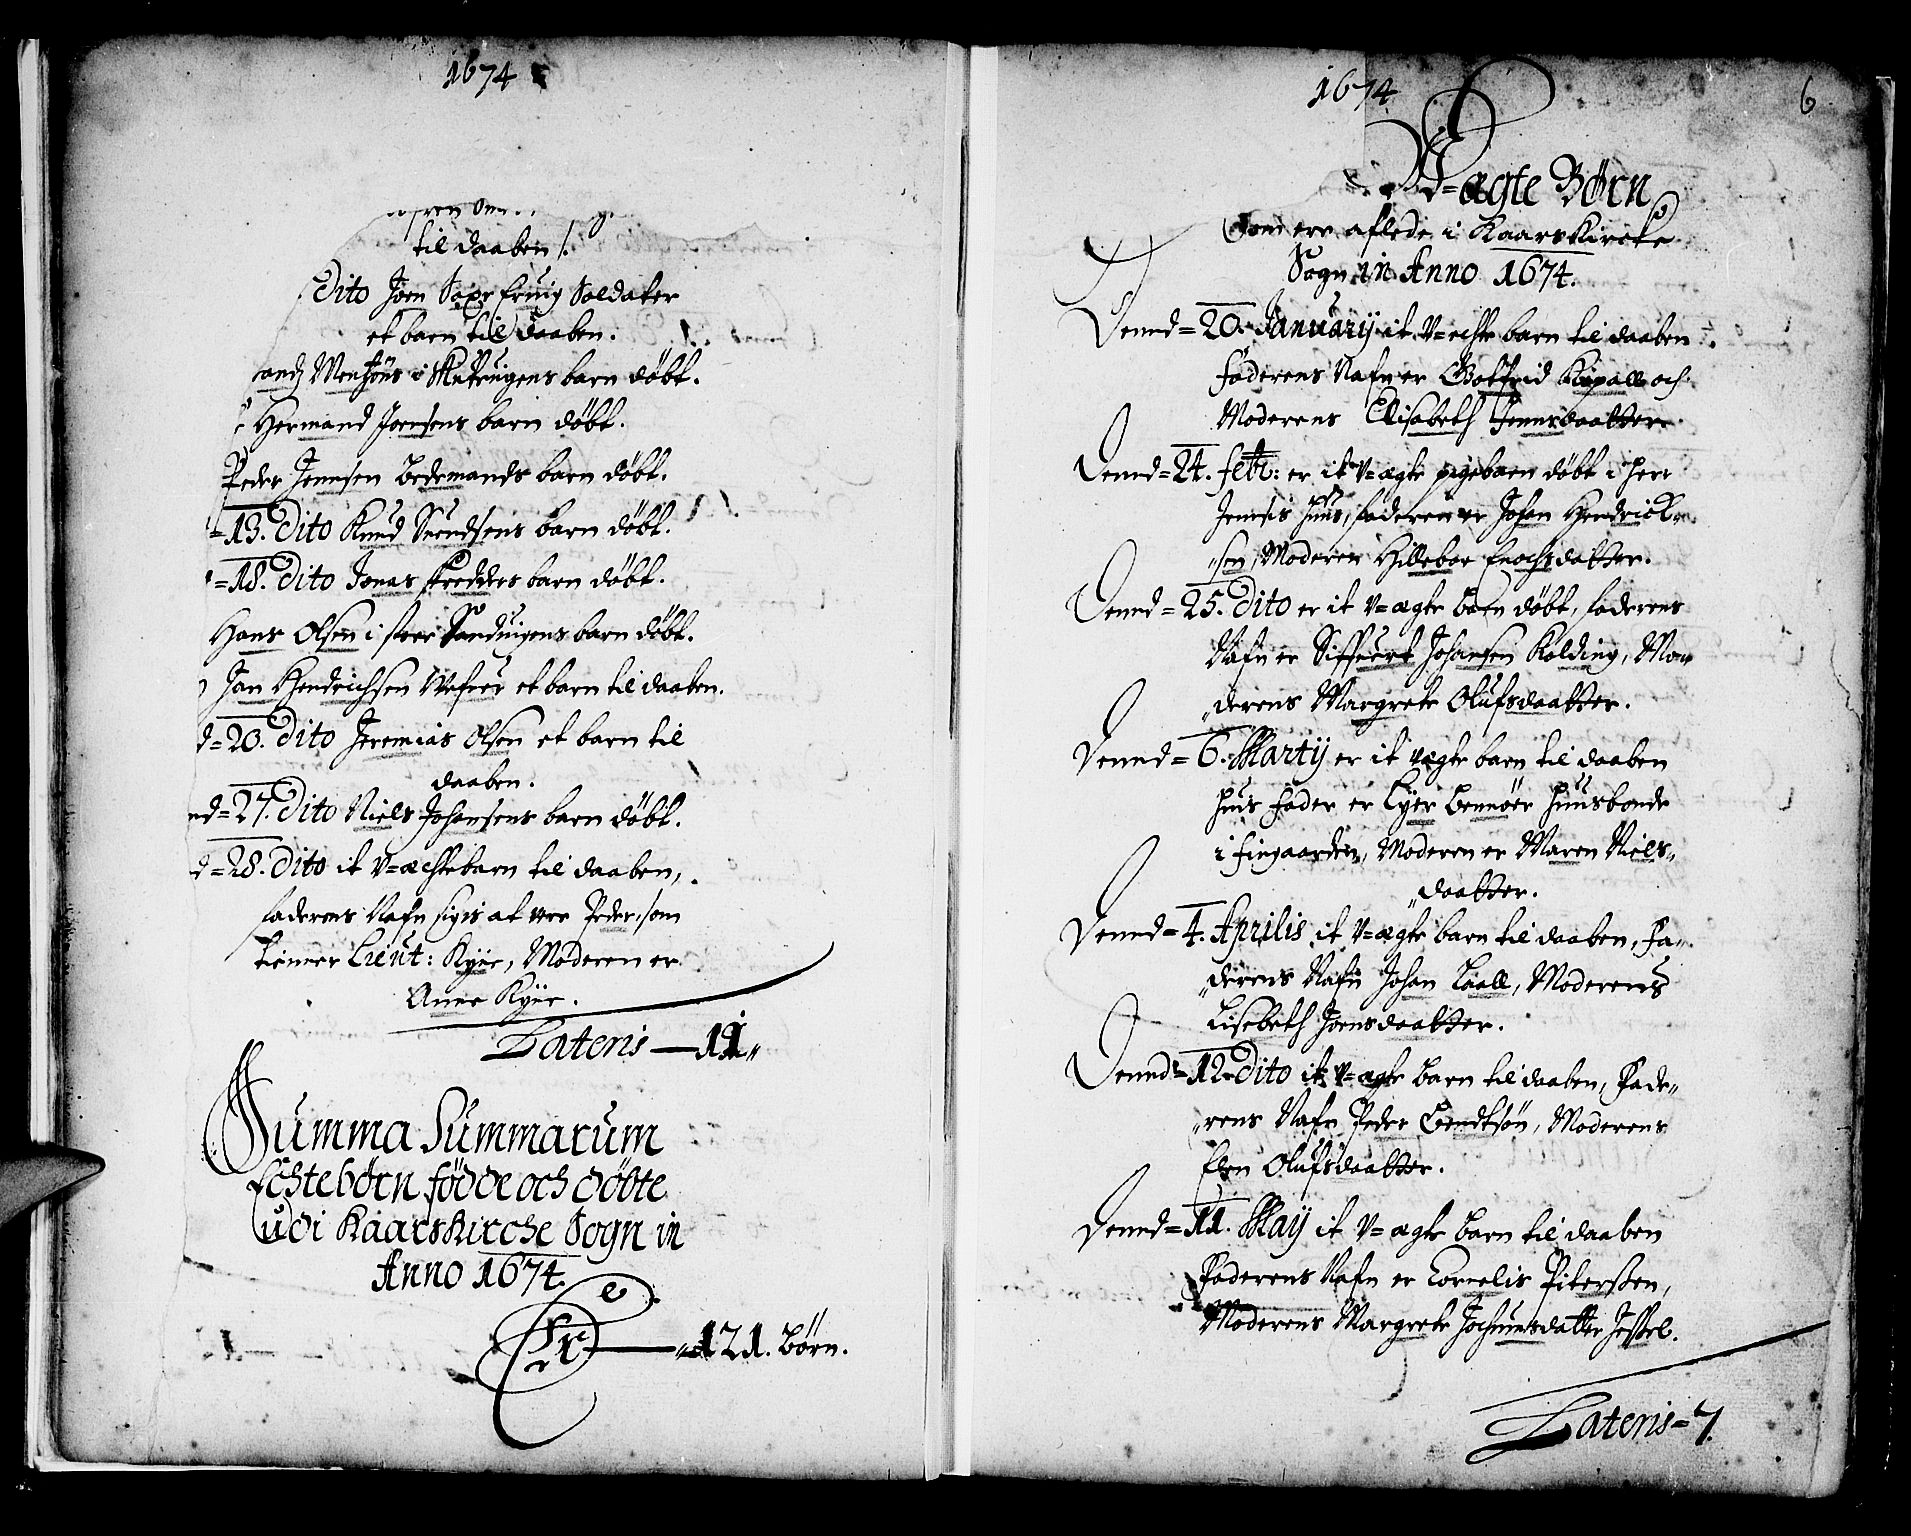 SAB, Korskirken Sokneprestembete, H/Haa/L0001: Ministerialbok nr. A 1, 1674-1688, s. 6